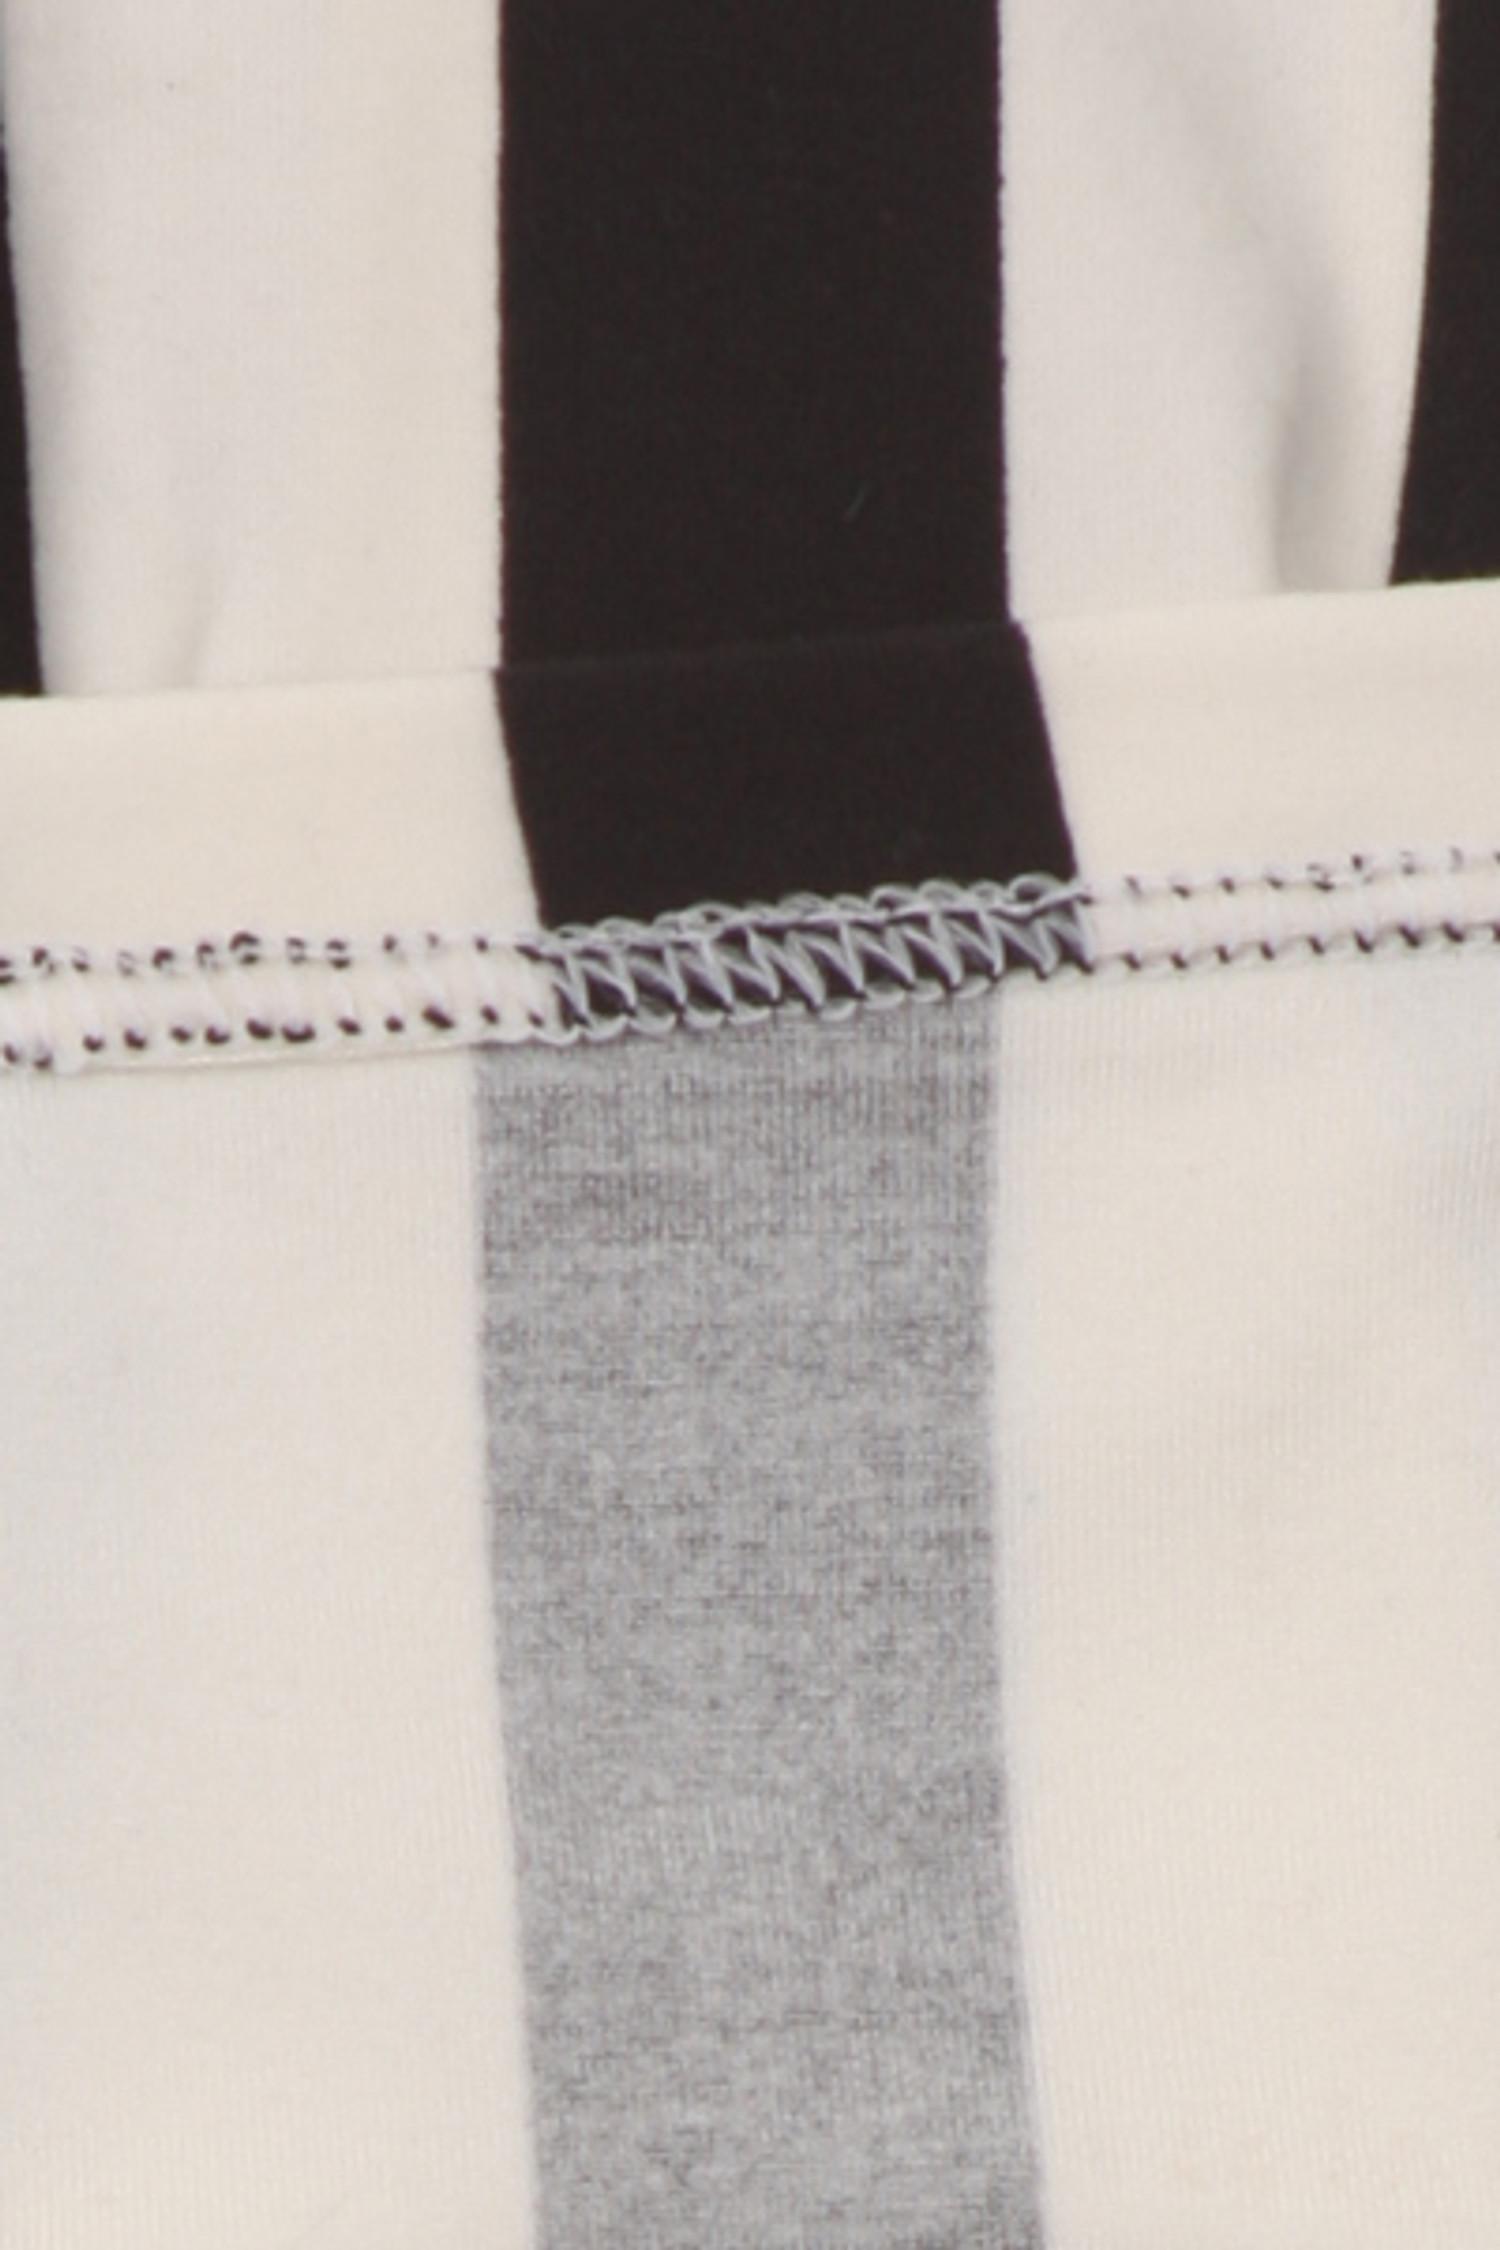 Brushed Vertical Black and White Striped Kids Leggings